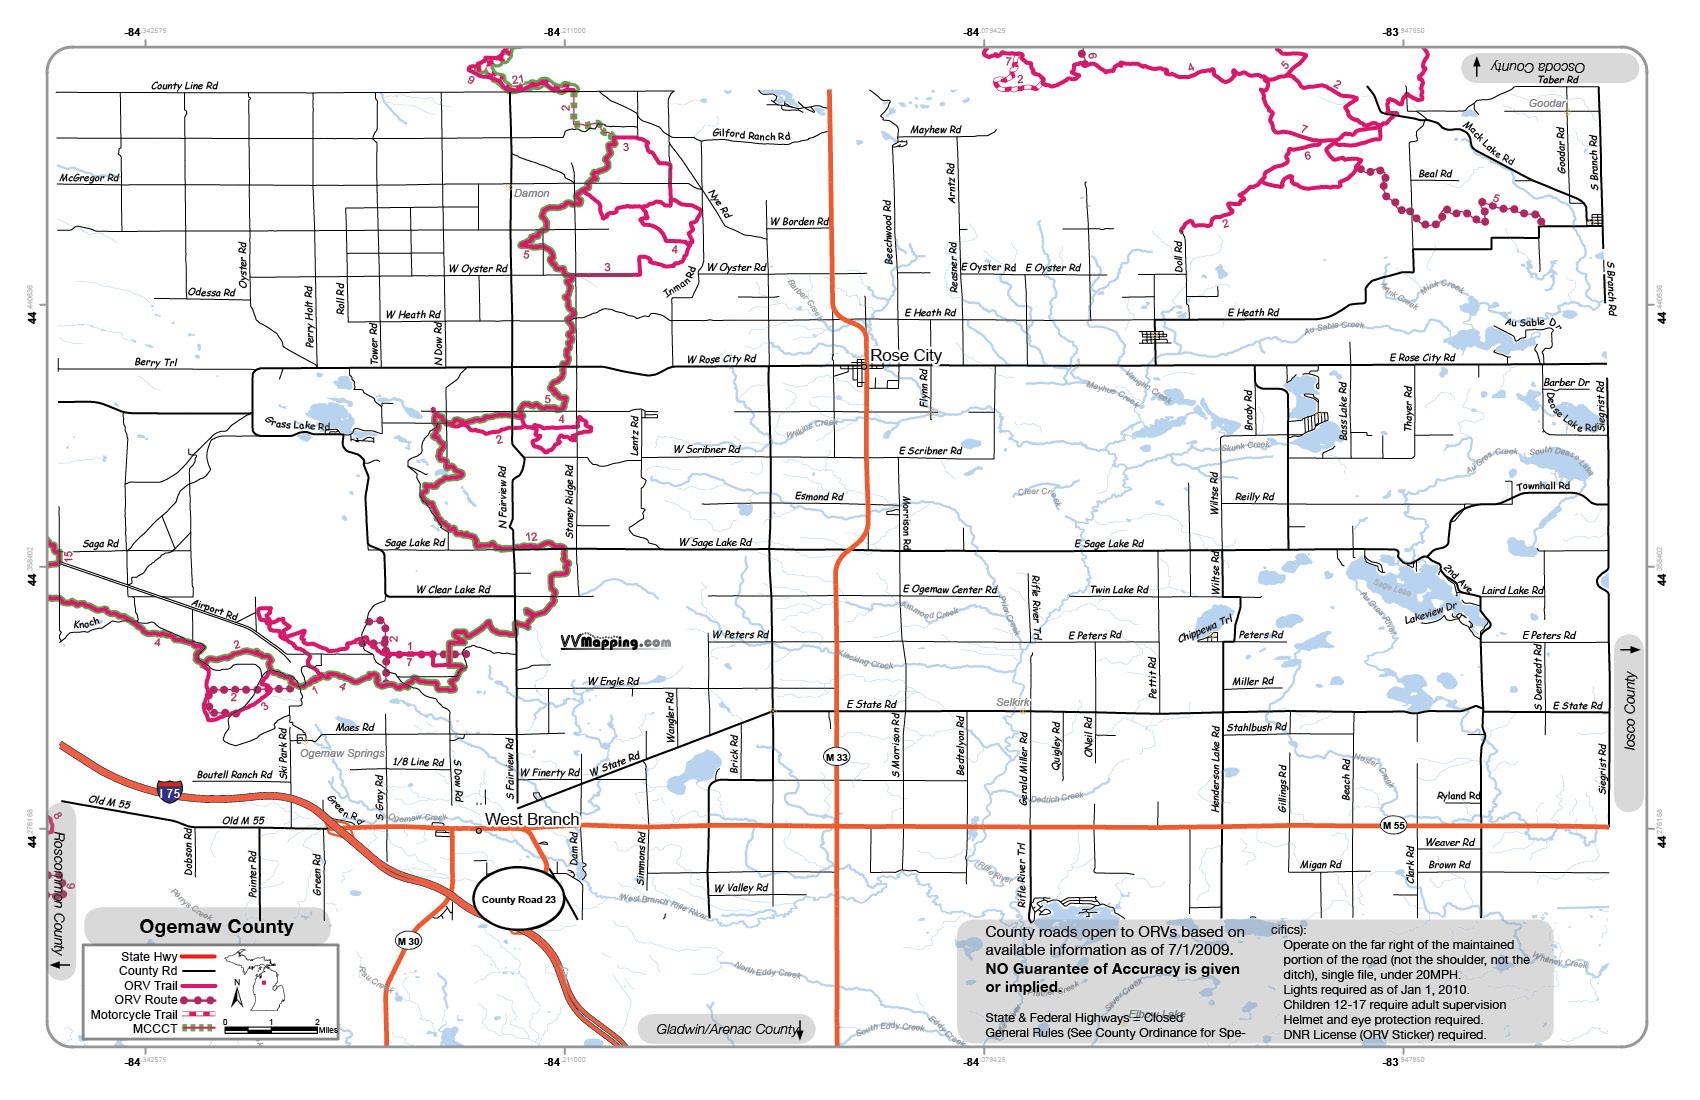 ... bull gap ogemaw hills rose city st helen mccct map vvmap ogemaw pdf